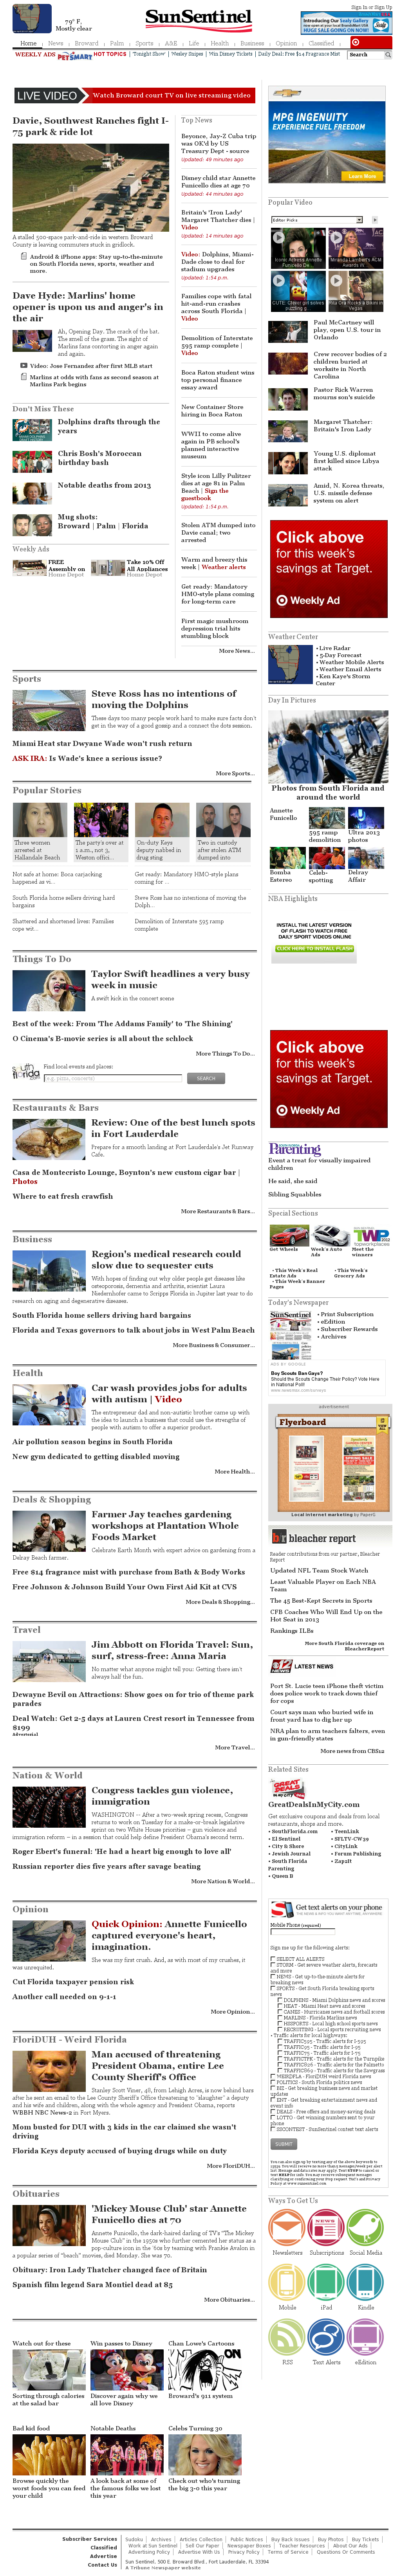 (Florida) Sun Sentinel at Monday April 8, 2013, 7:23 p.m. UTC